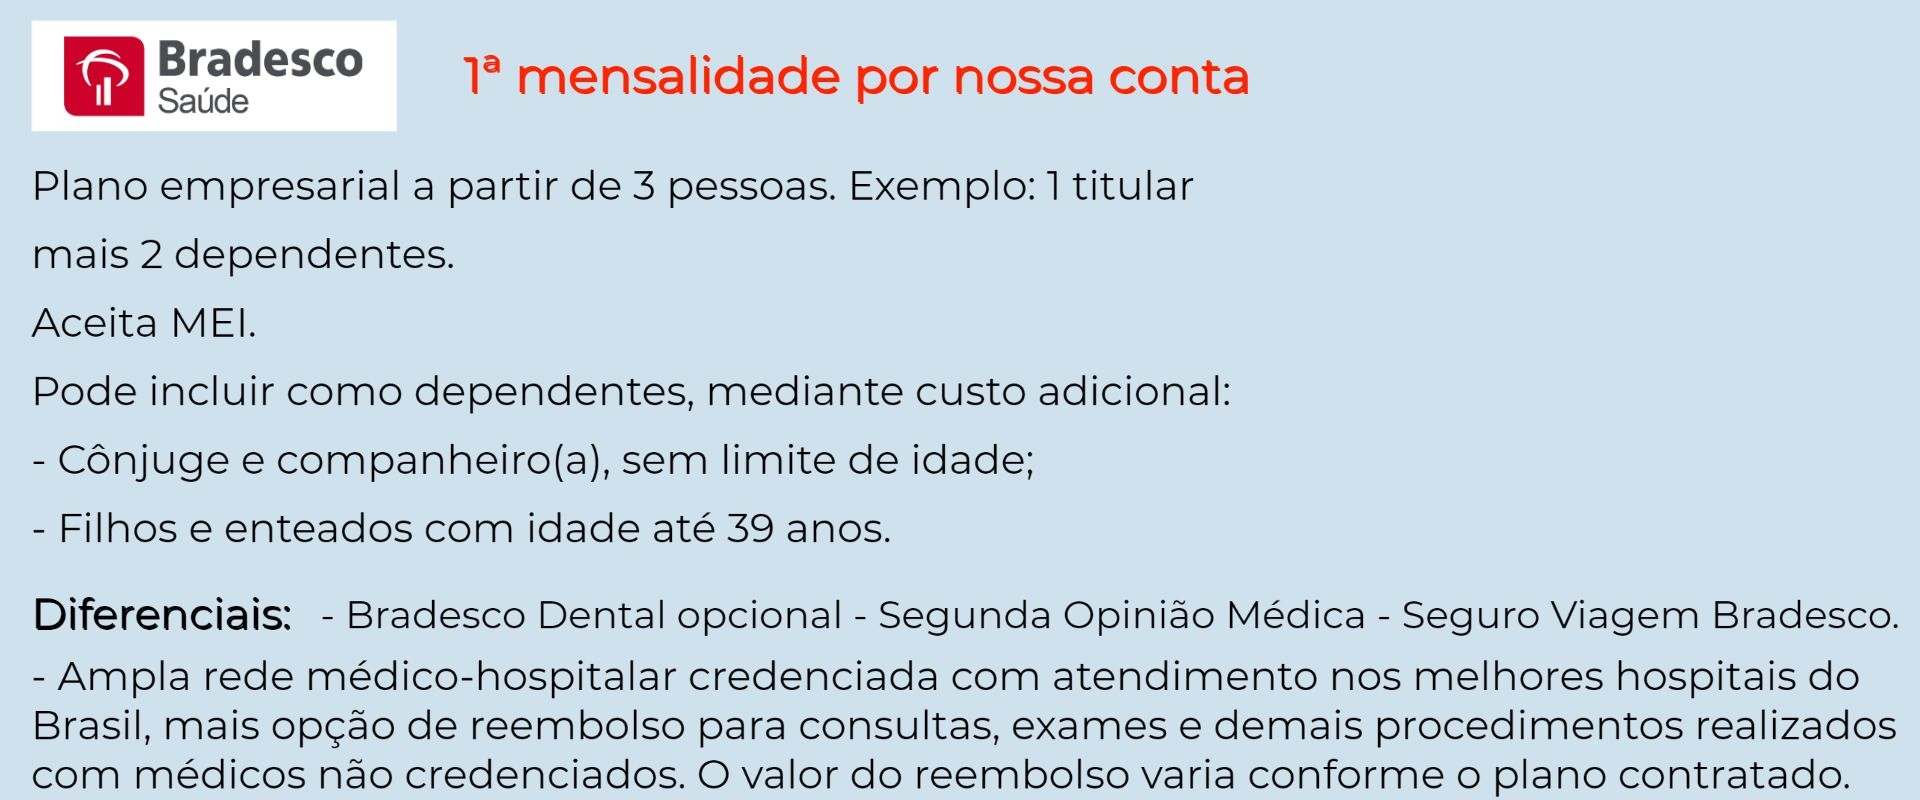 Bradesco Saúde Empresarial - Vera Cruz